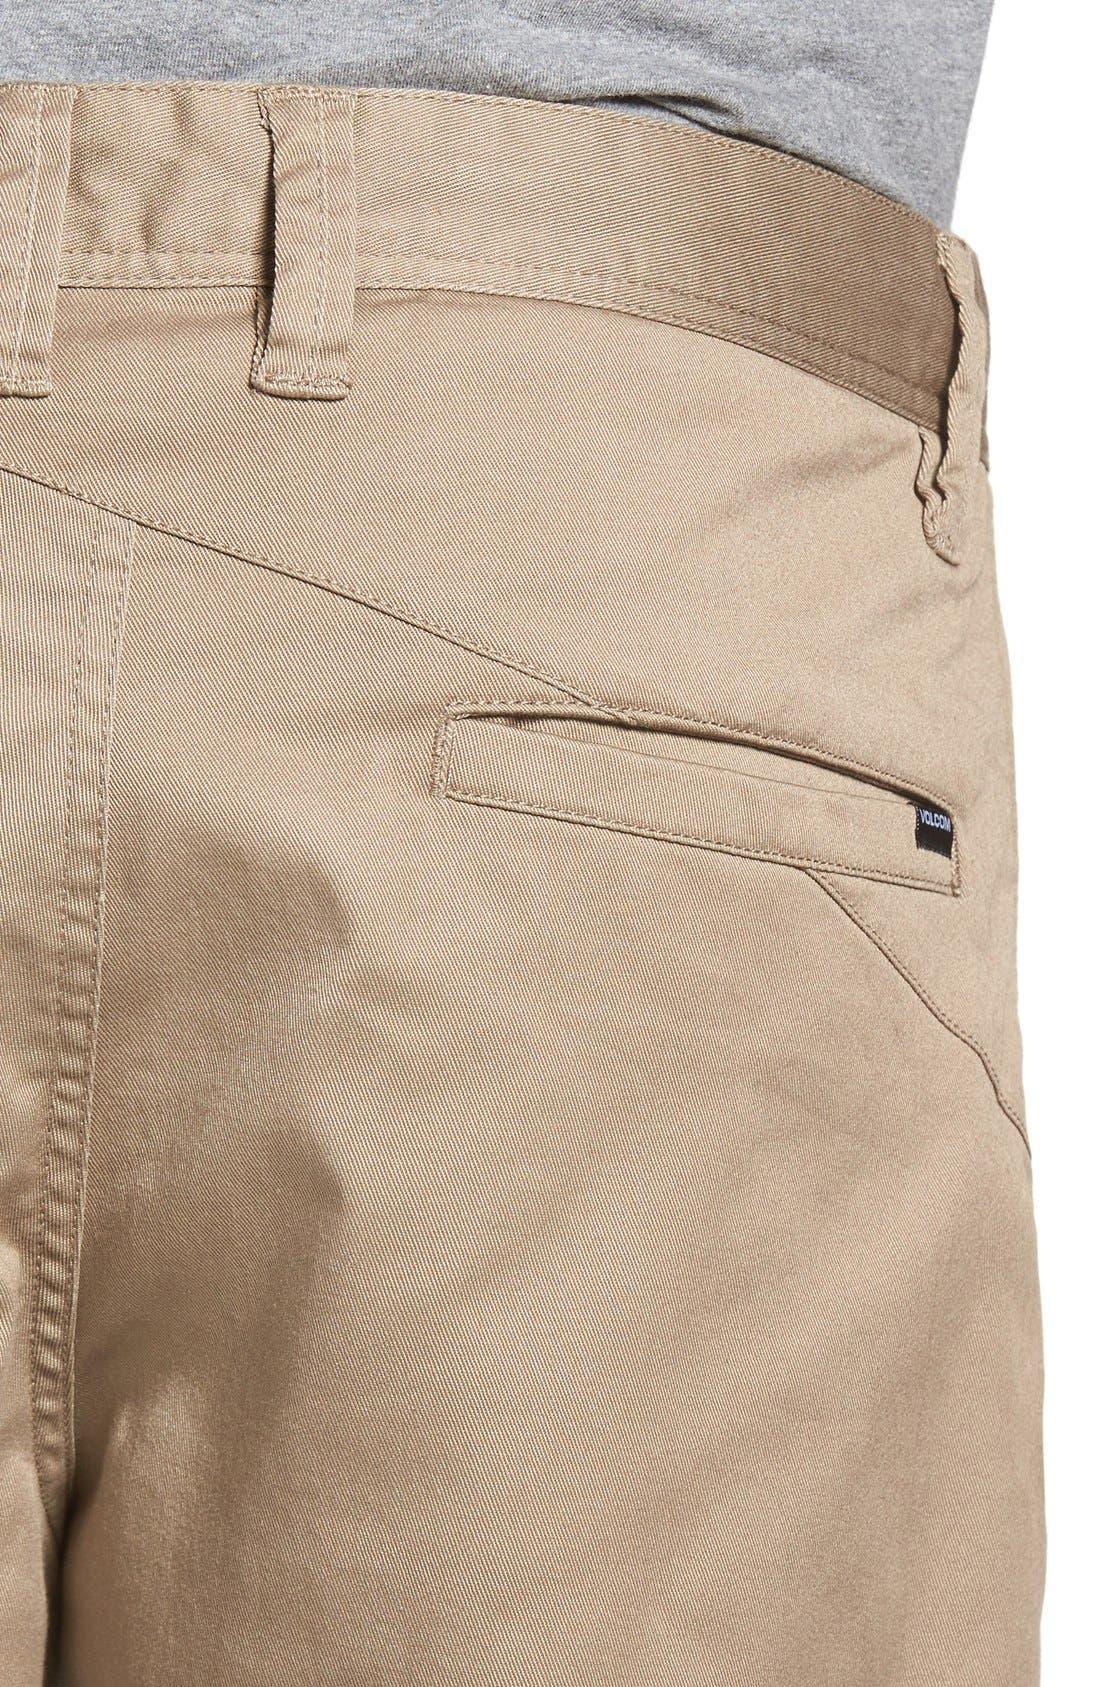 'Modern' Stretch Chino Shorts,                             Alternate thumbnail 61, color,